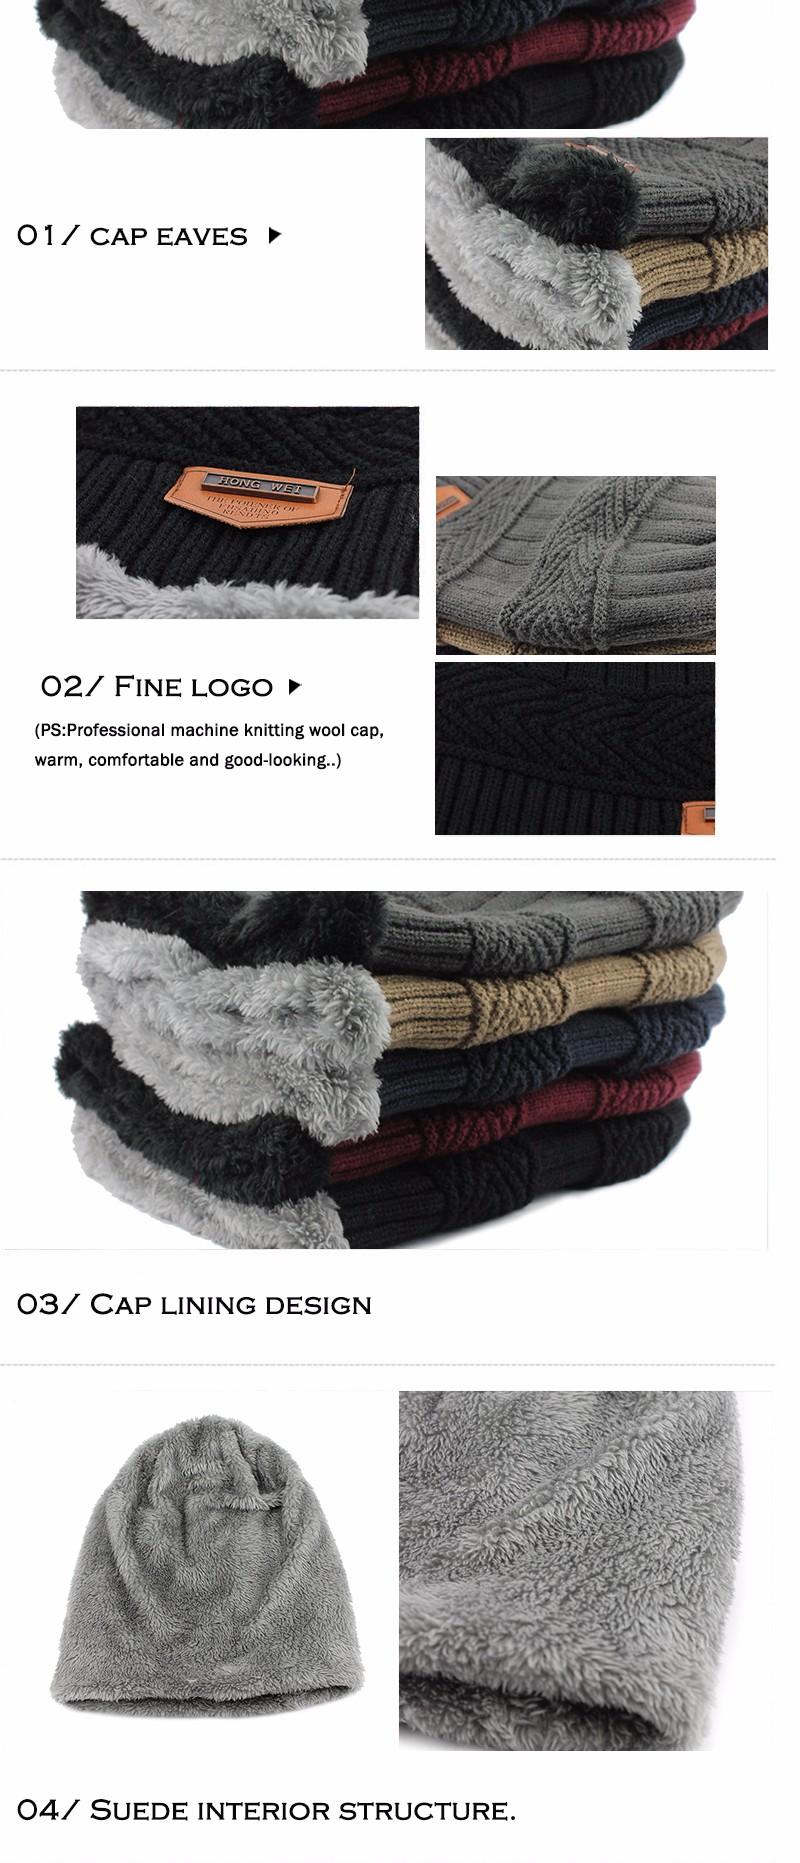 FETSBUY Pure Color Winter Skullies Beanies Hat Knit Winter Hat For Man Warm Hat Velvet Cap Bonnet Toucas Inverno Knitted Hats 21